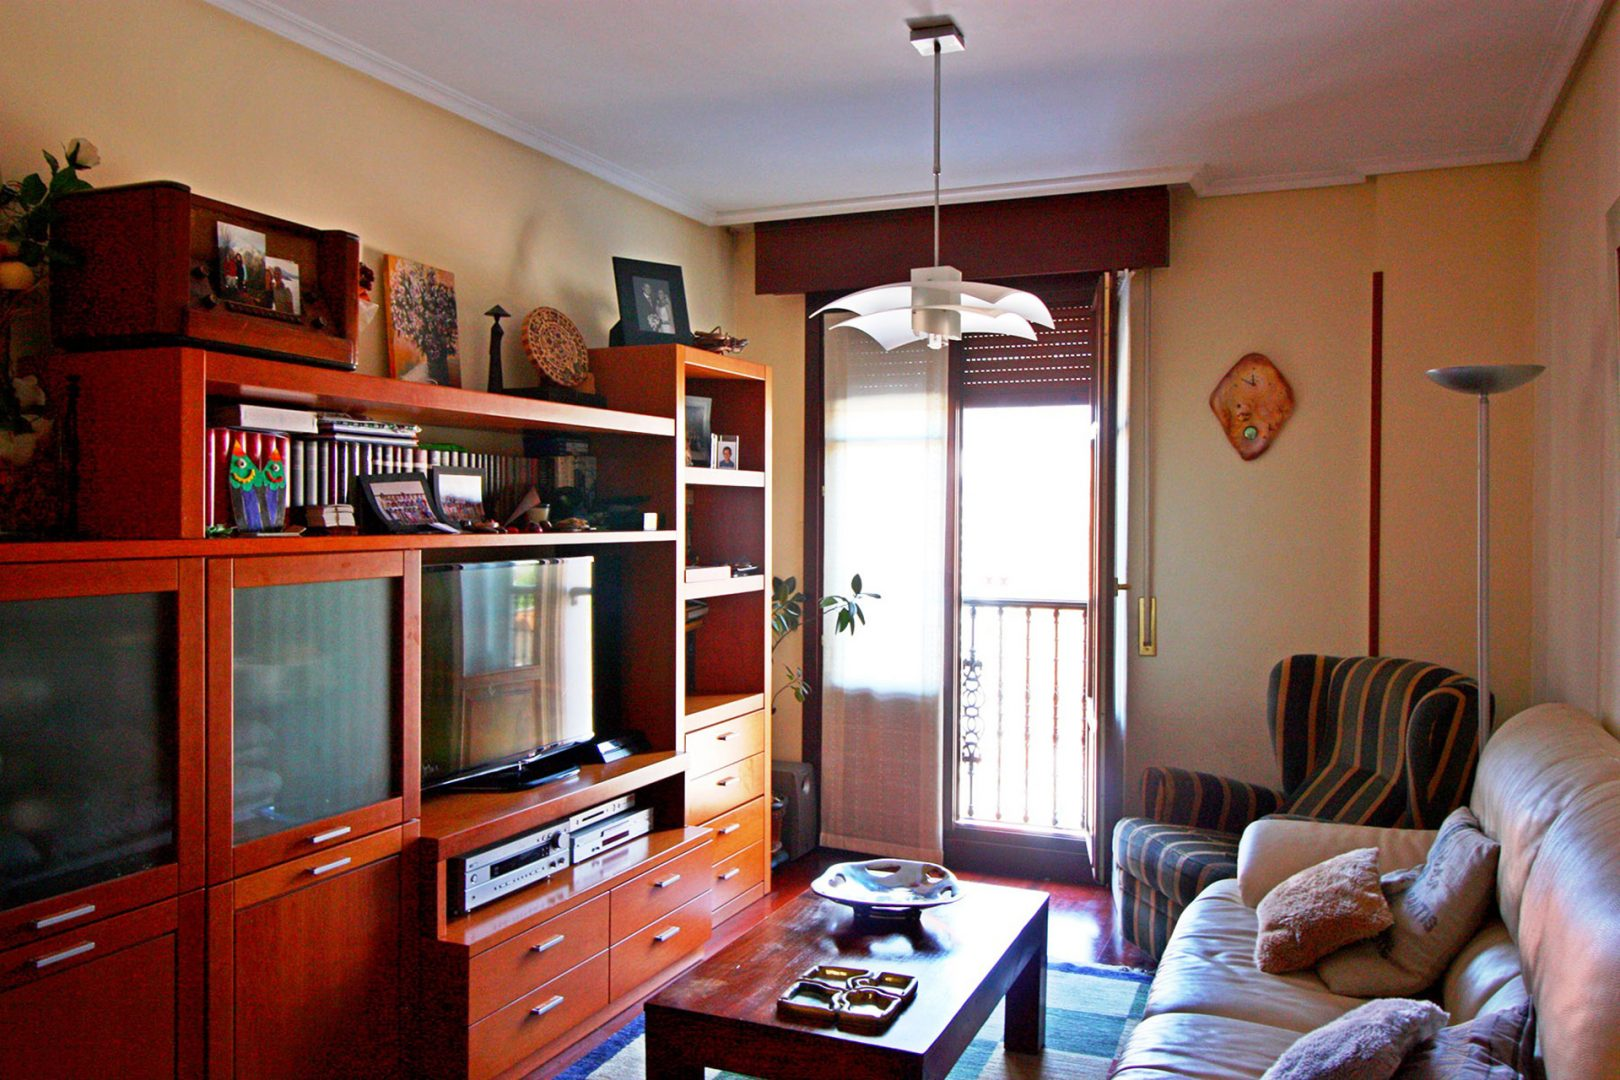 Compar piso en am zola inmobiliaria city - Vivir en un segundo piso ...